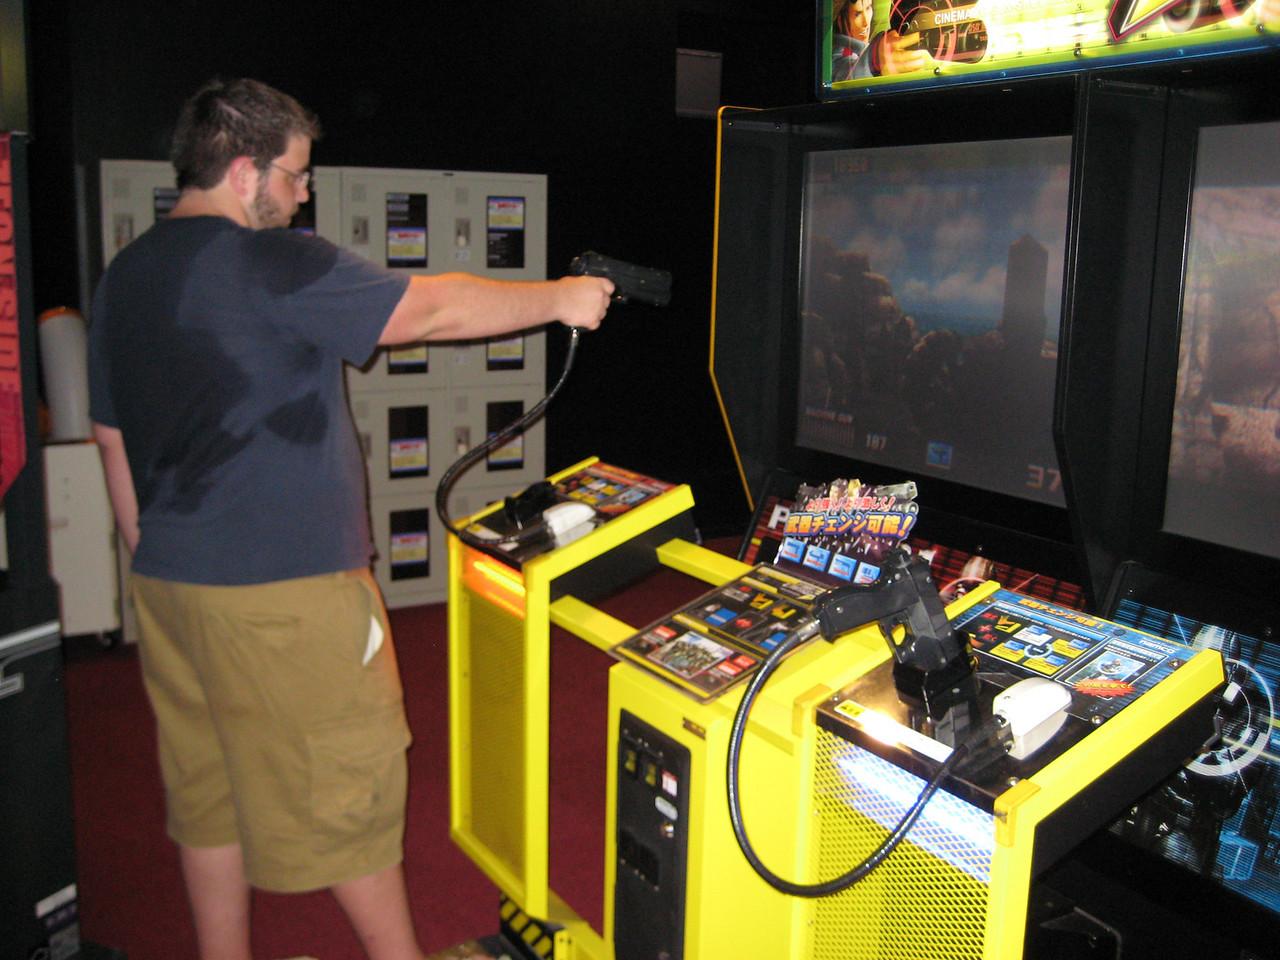 Josh dominates at the shooting games.